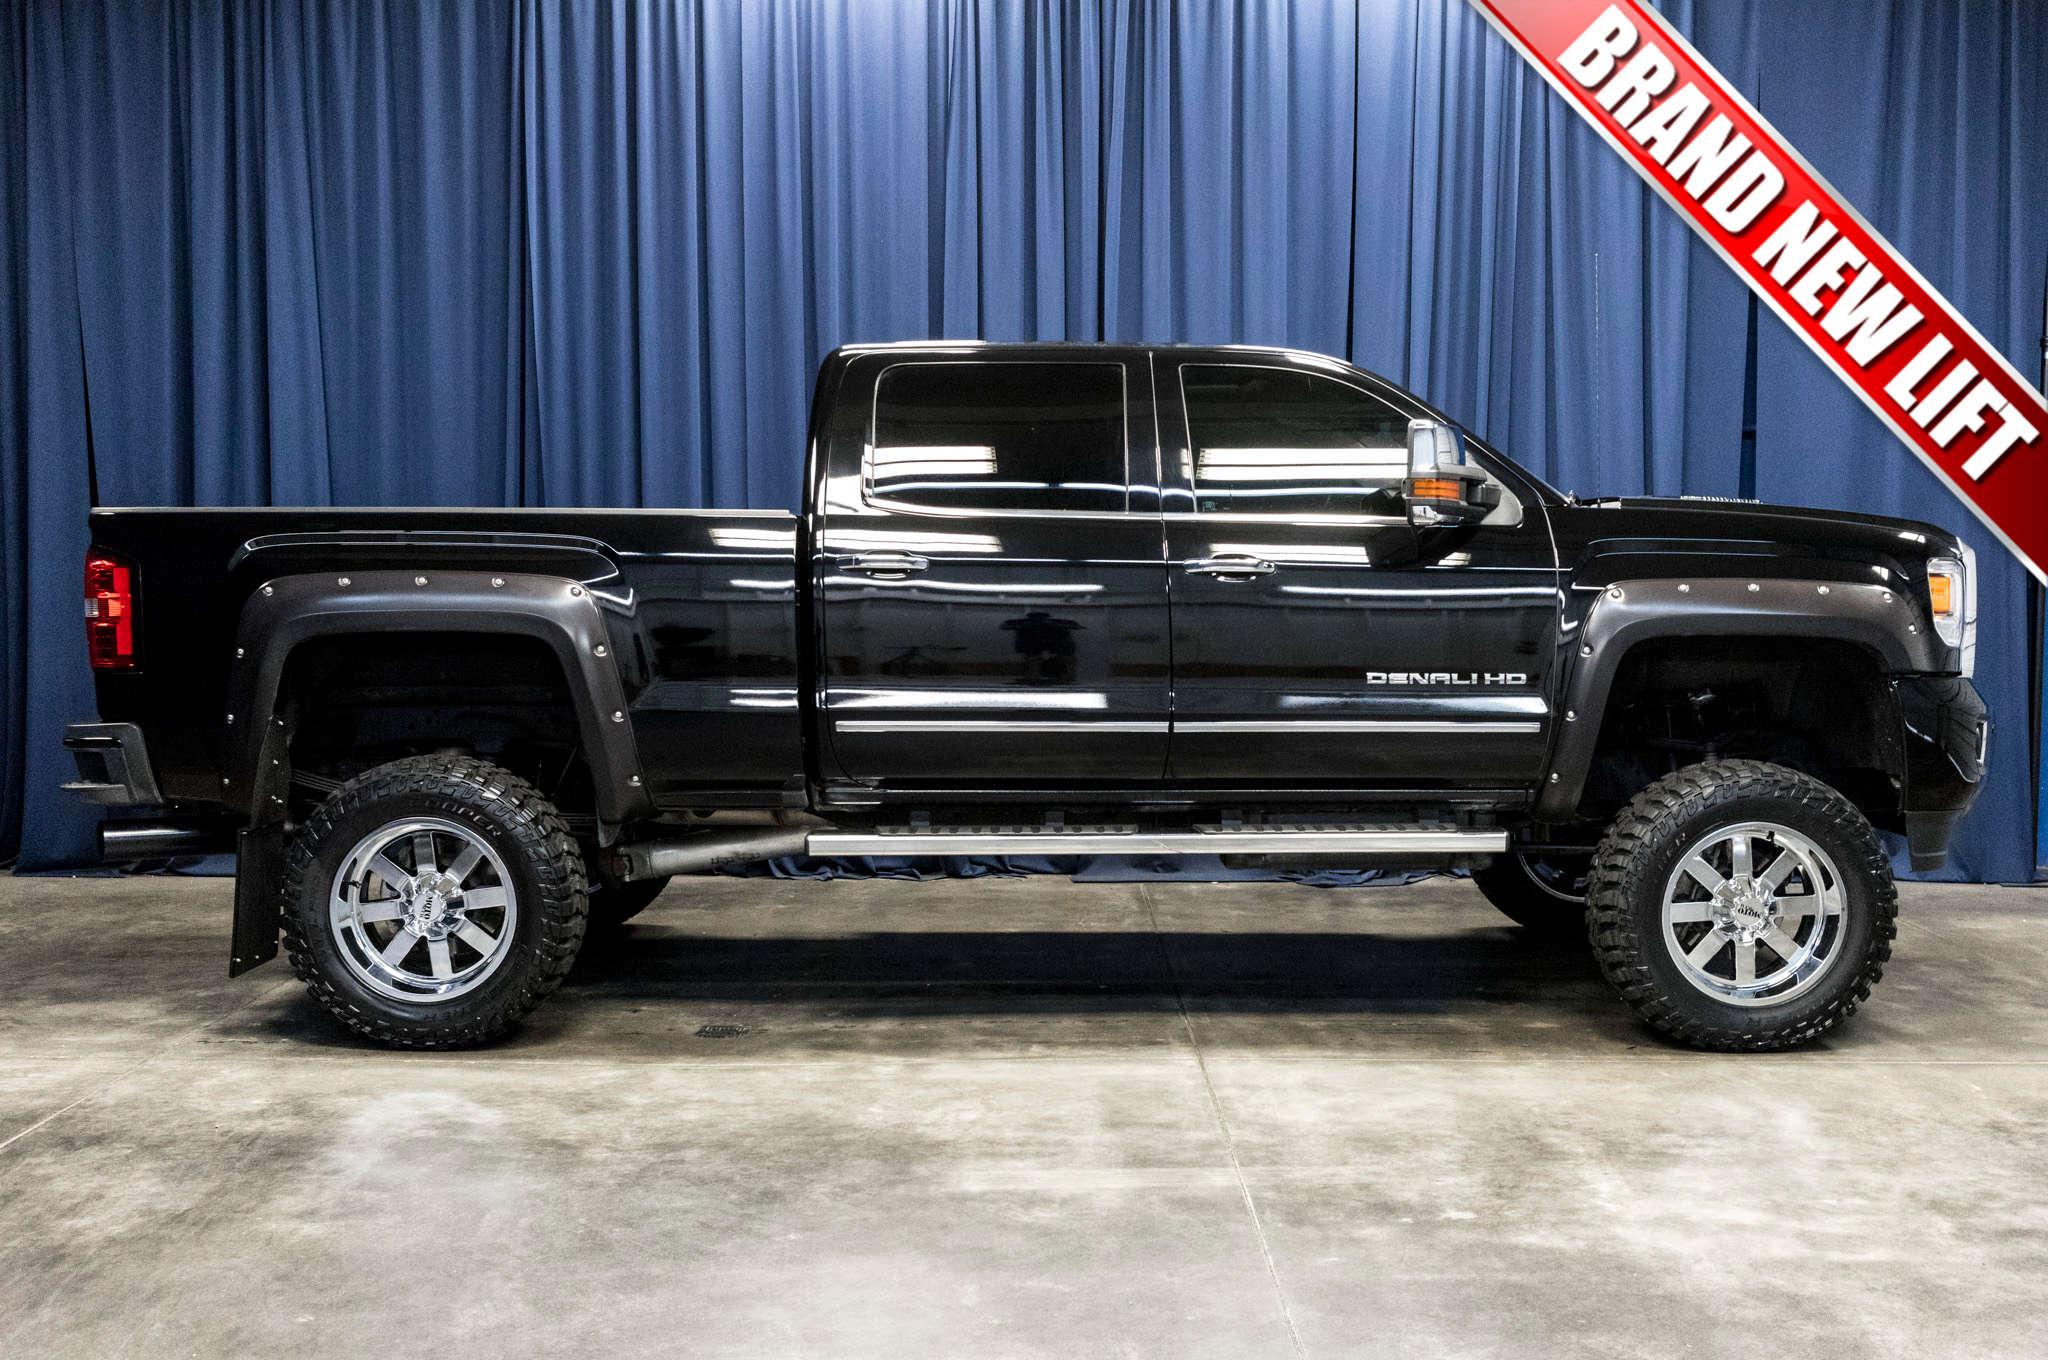 Used Lifted 2016 Gmc Sierra 2500hd Denali 4x4 Diesel Truck For Sale Northwest Motorsport